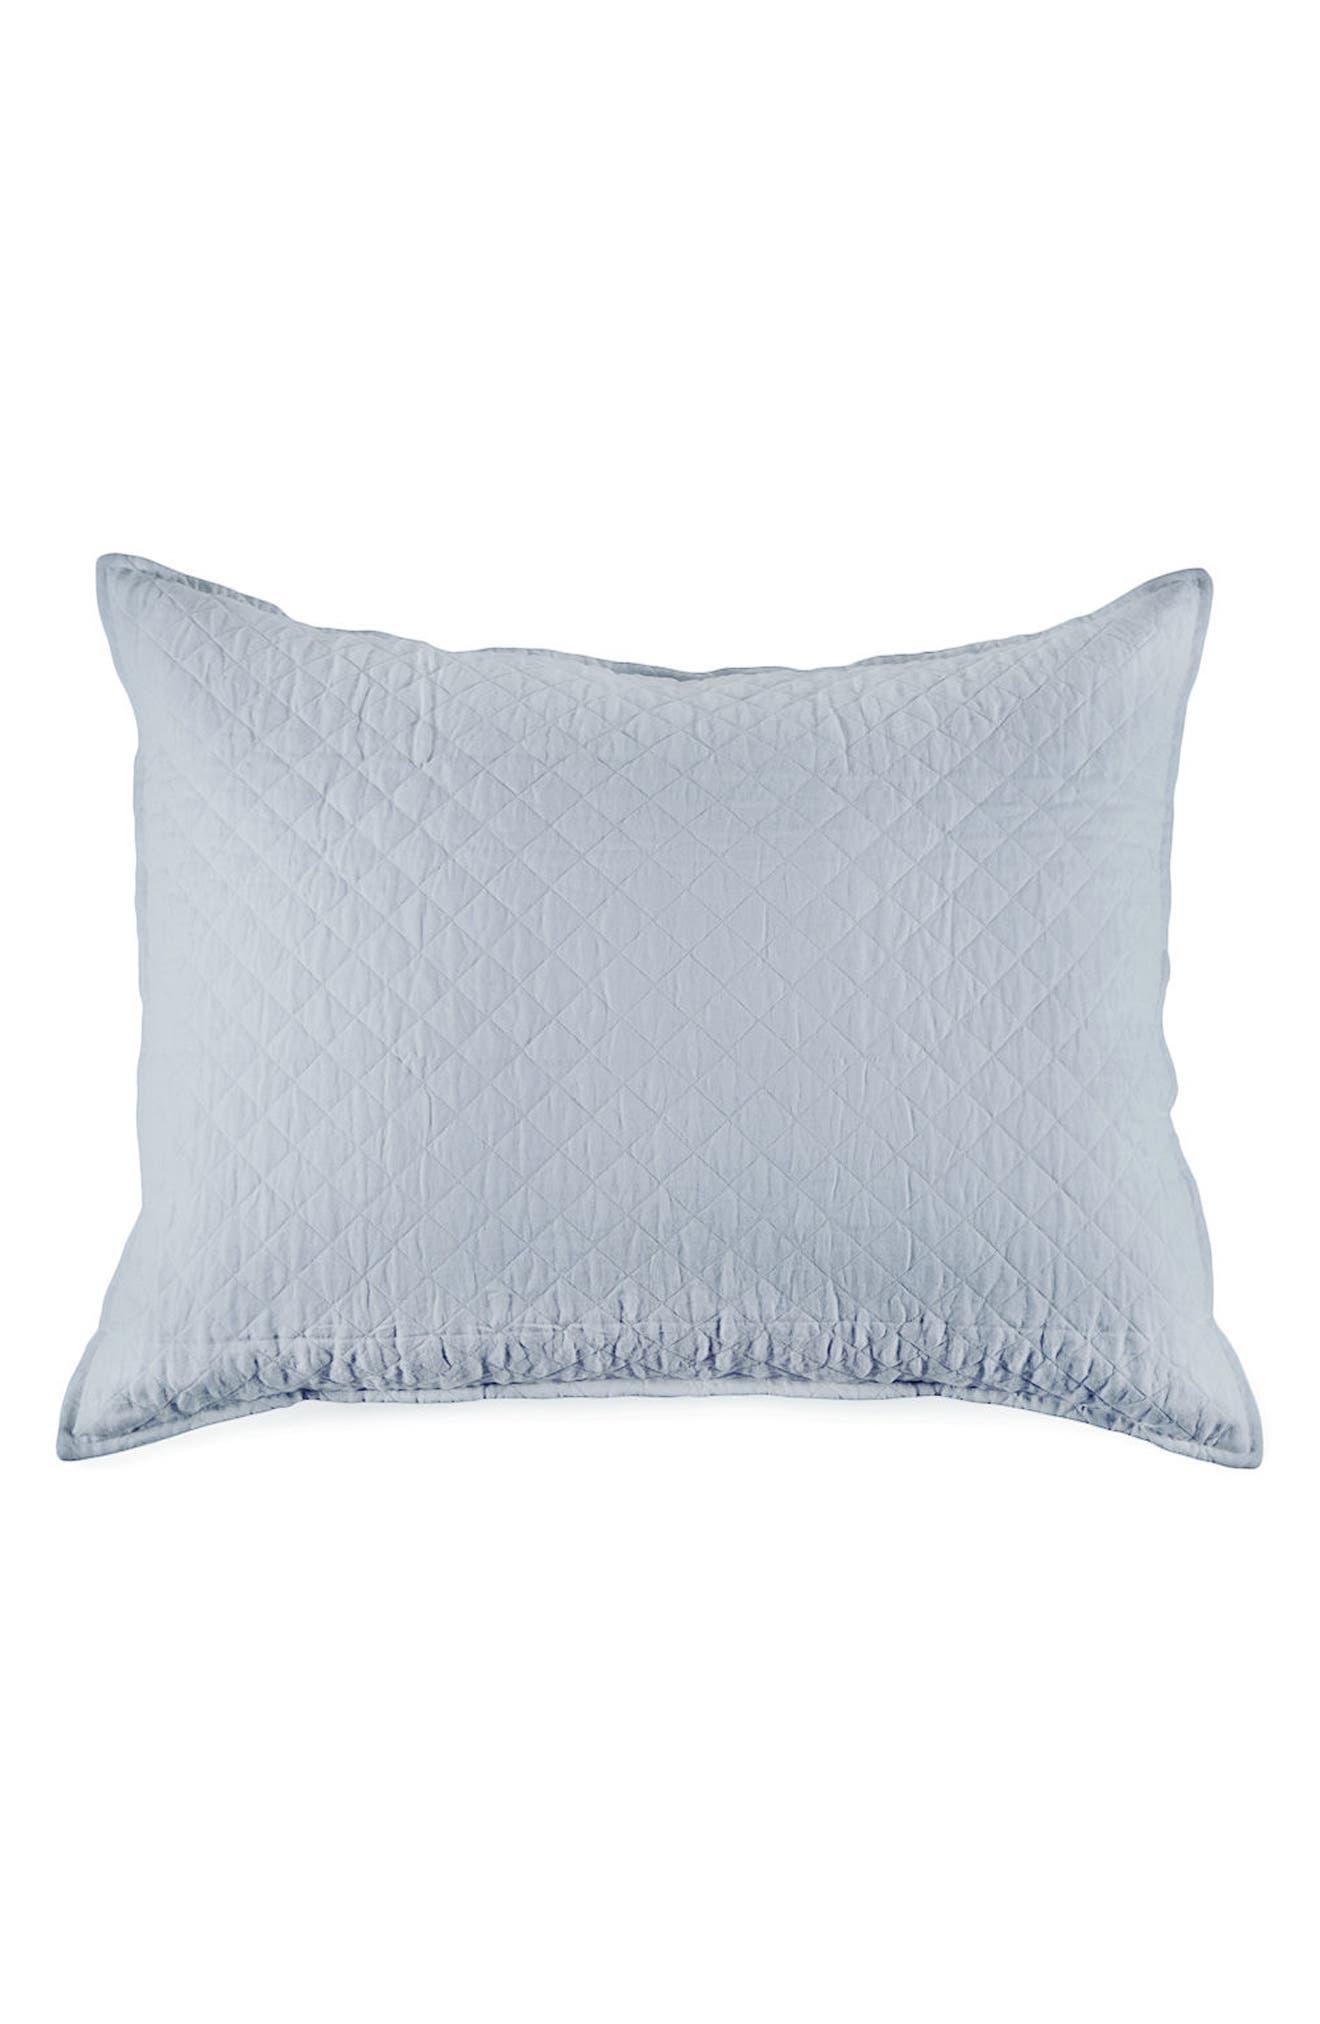 Main Image - Pom Pom at Home Hampton Big Accent Pillow